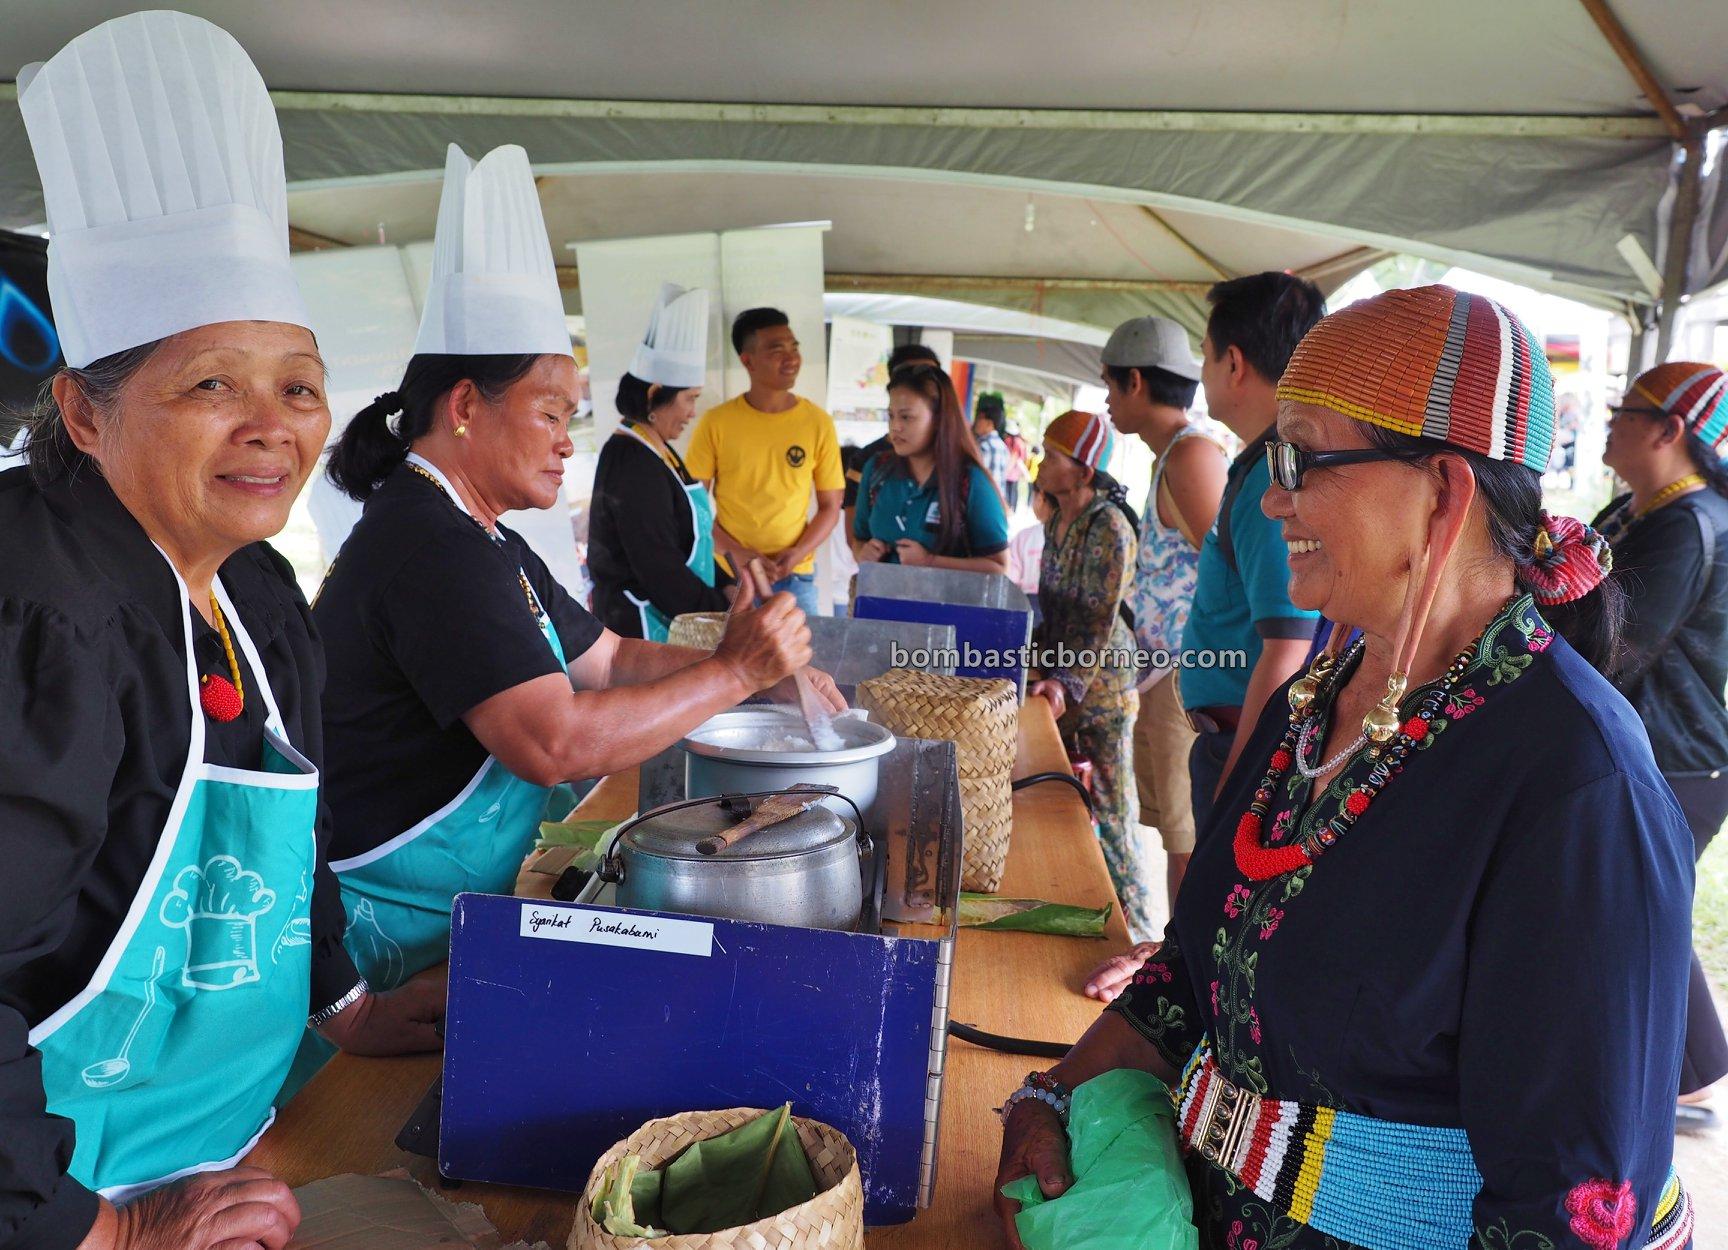 Pesta Nukenen, Bario Food Cultural Festival, traditional, backpackers, exploration, dayak, Ethnic, native, Orang Ulu, Kelabit people, Highlands, Borneo, 马来西亚内陆高原, 巴里奥加拉毕族文化, 砂拉越乌鲁人部落,